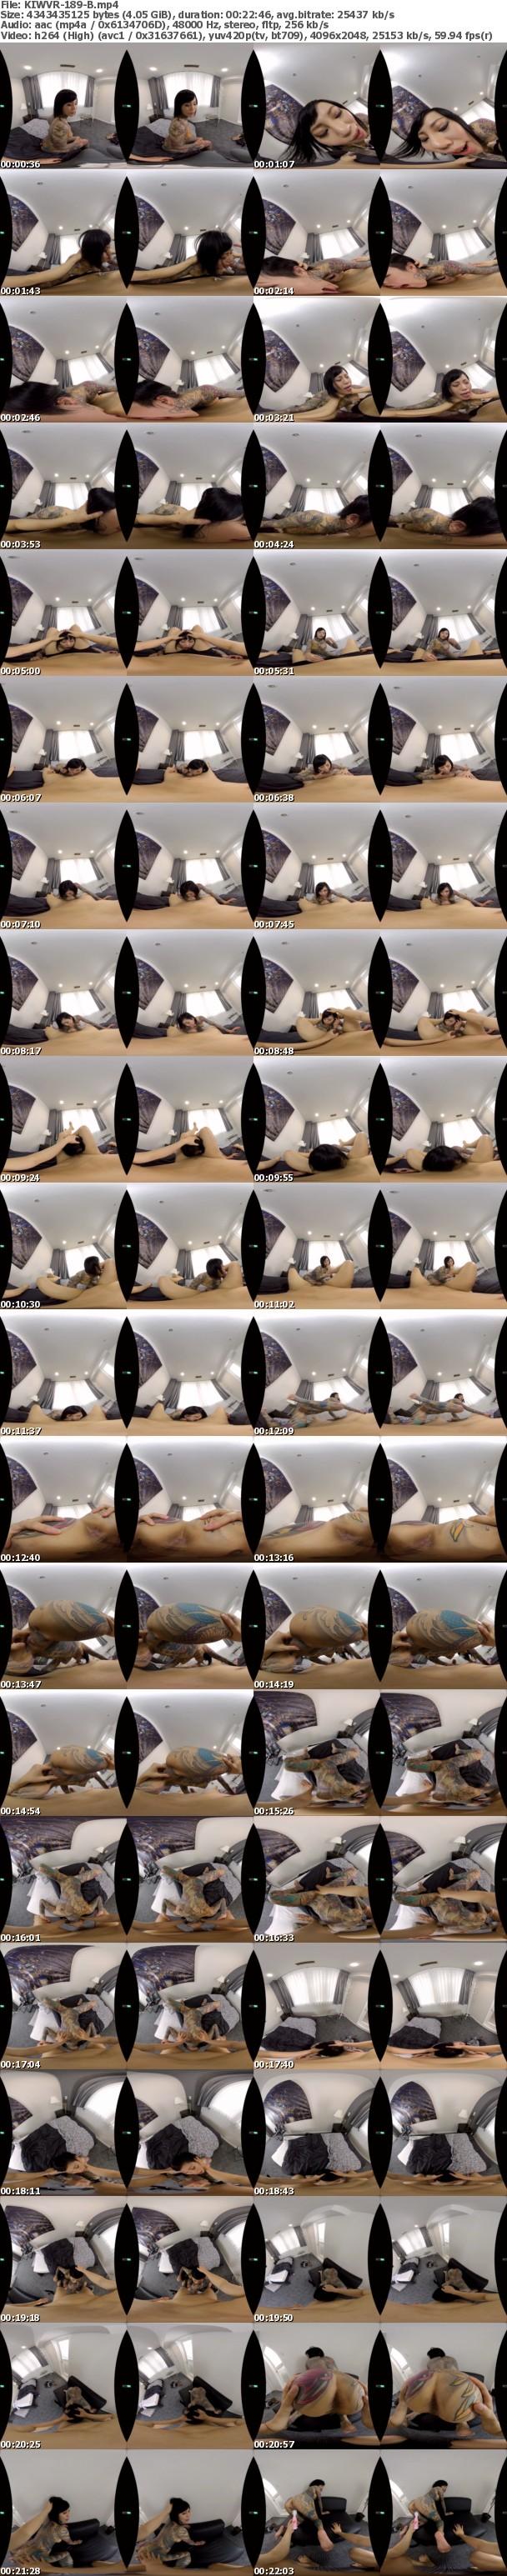 (VR) KIWVR-189 真性マゾ【全身タトゥーの痴女系女子】に責めてもらう気マンマンだったのに…【ほんとはドM】で乱暴なプレイをオネダリ!要望通りにイラマ、首絞め、スパンキング、玩具責めをしたら感じまくって絶頂連発!側位、騎乗位、座位、バック、… 桜雅凛